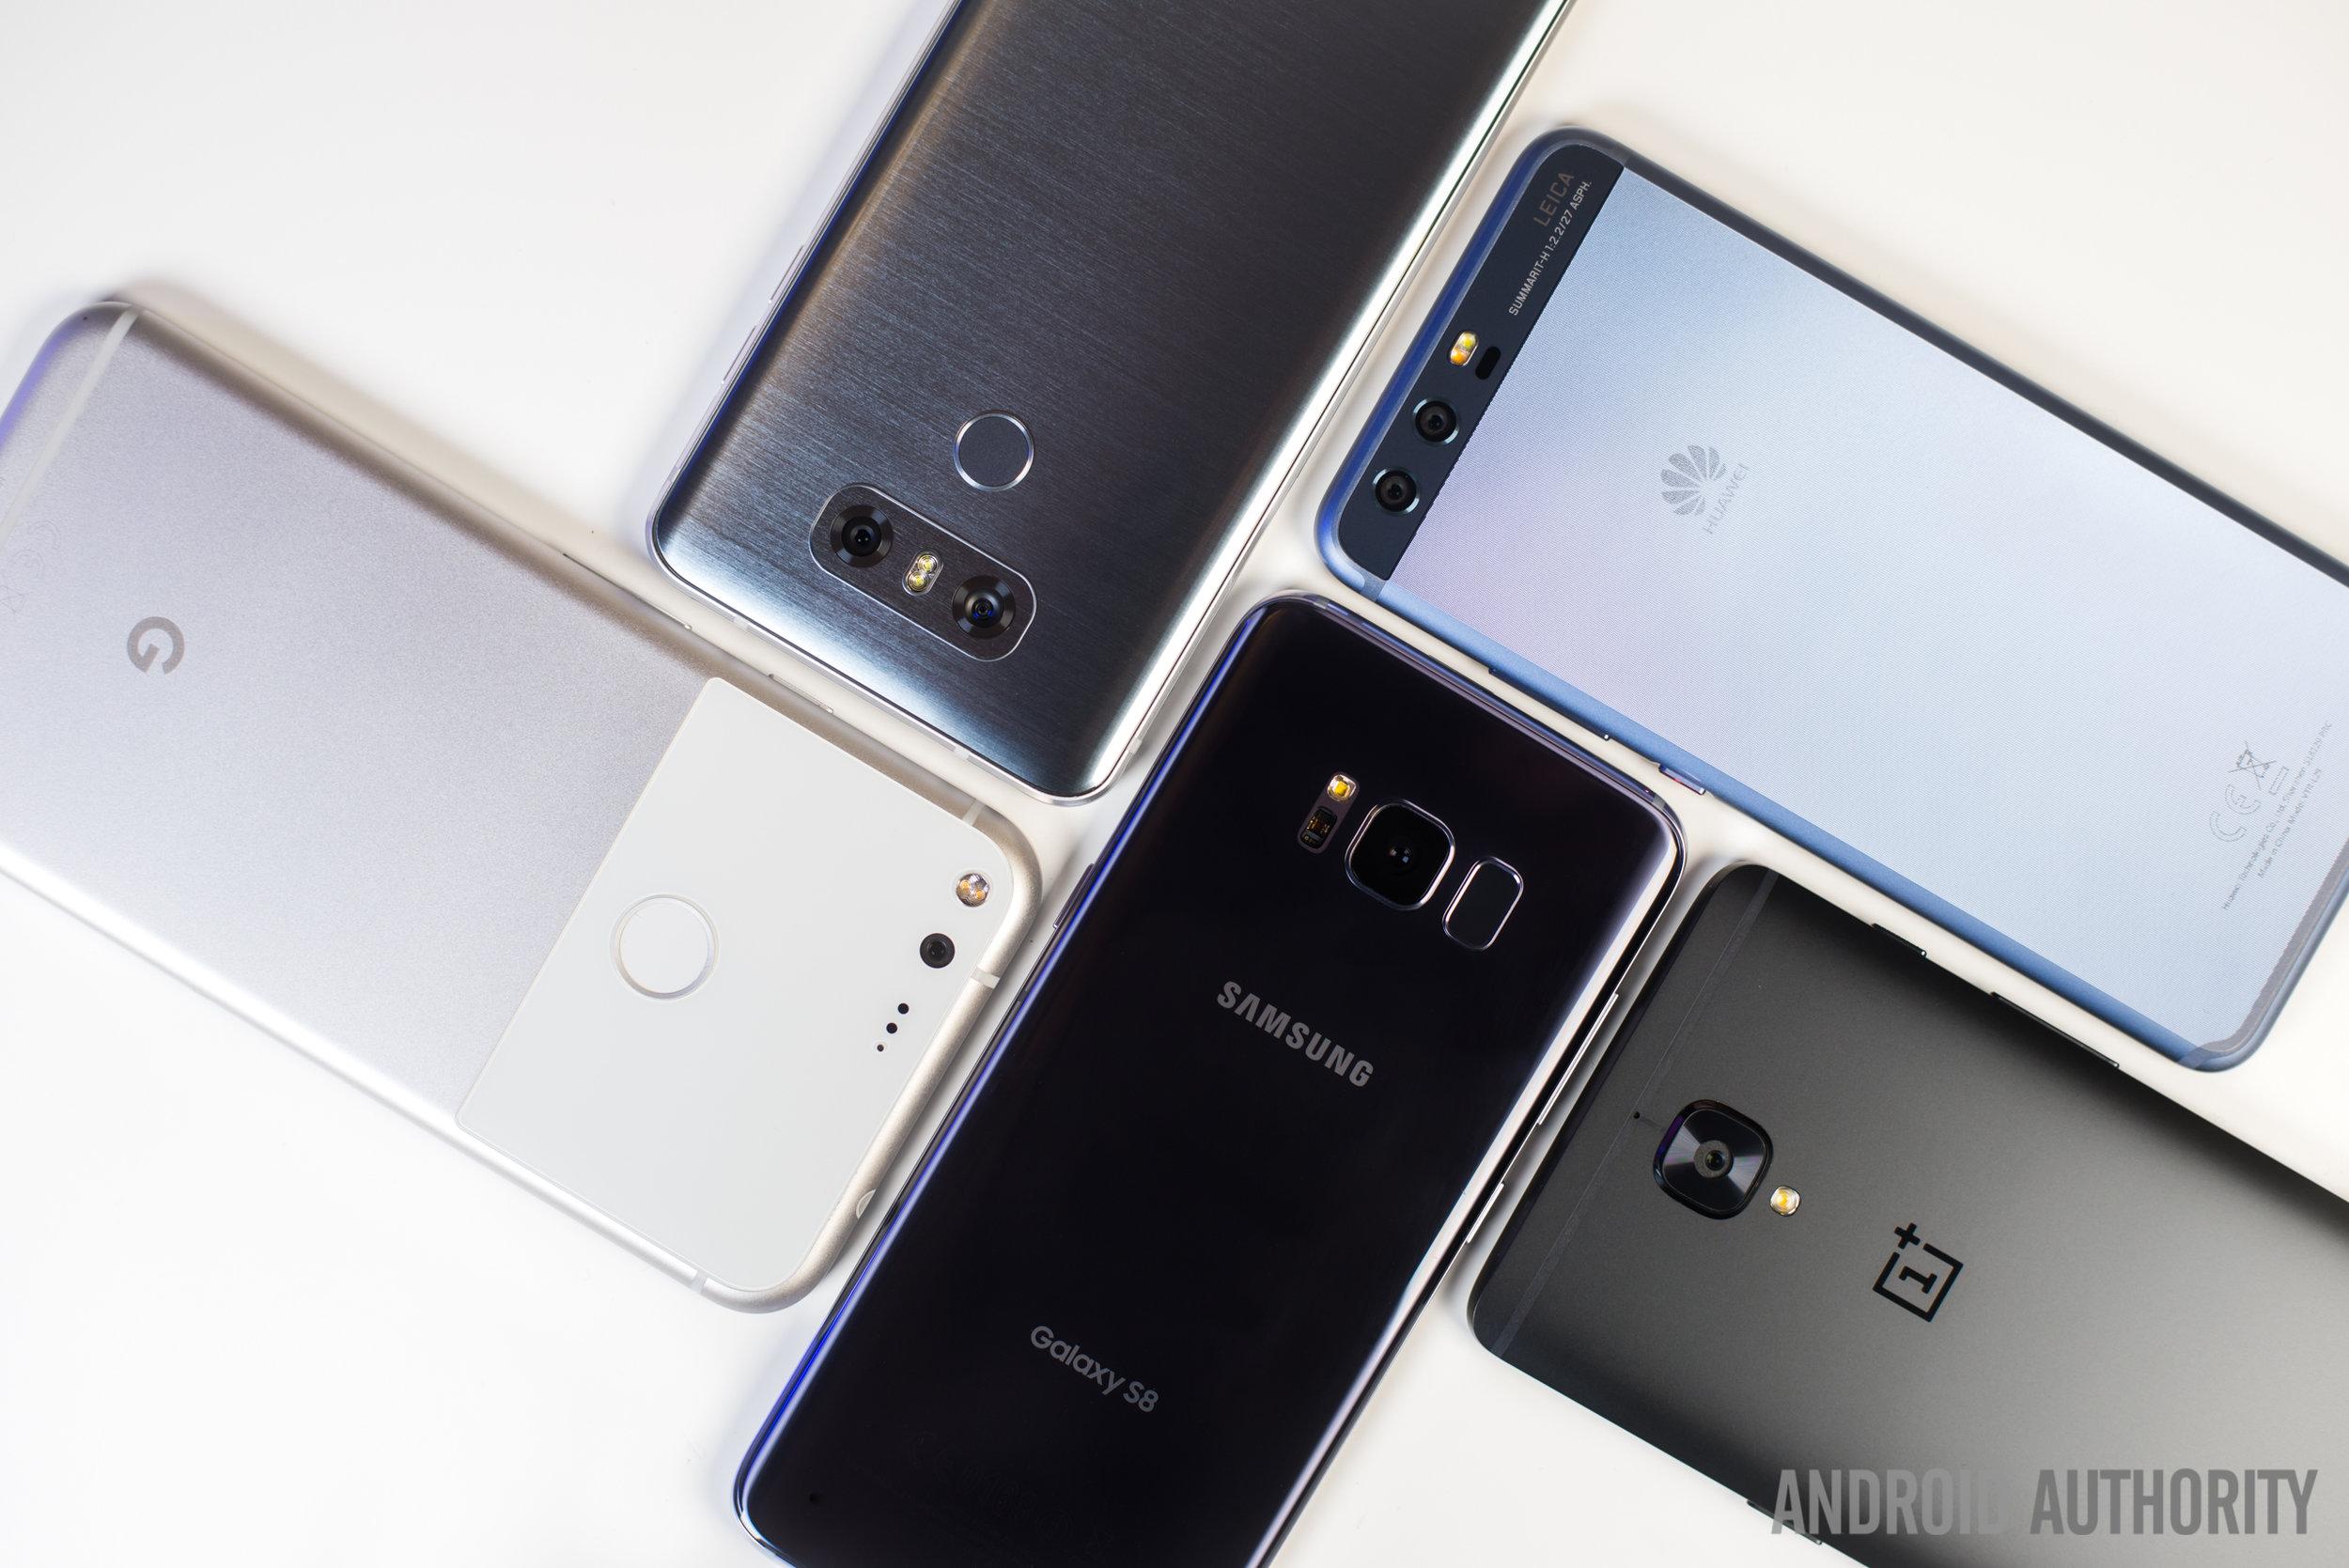 Camera-shootout-samsung-galaxy-s8-lg-g6-Google-Pixel-XL-OnePlus-3T-huawei-p10-1.JPG